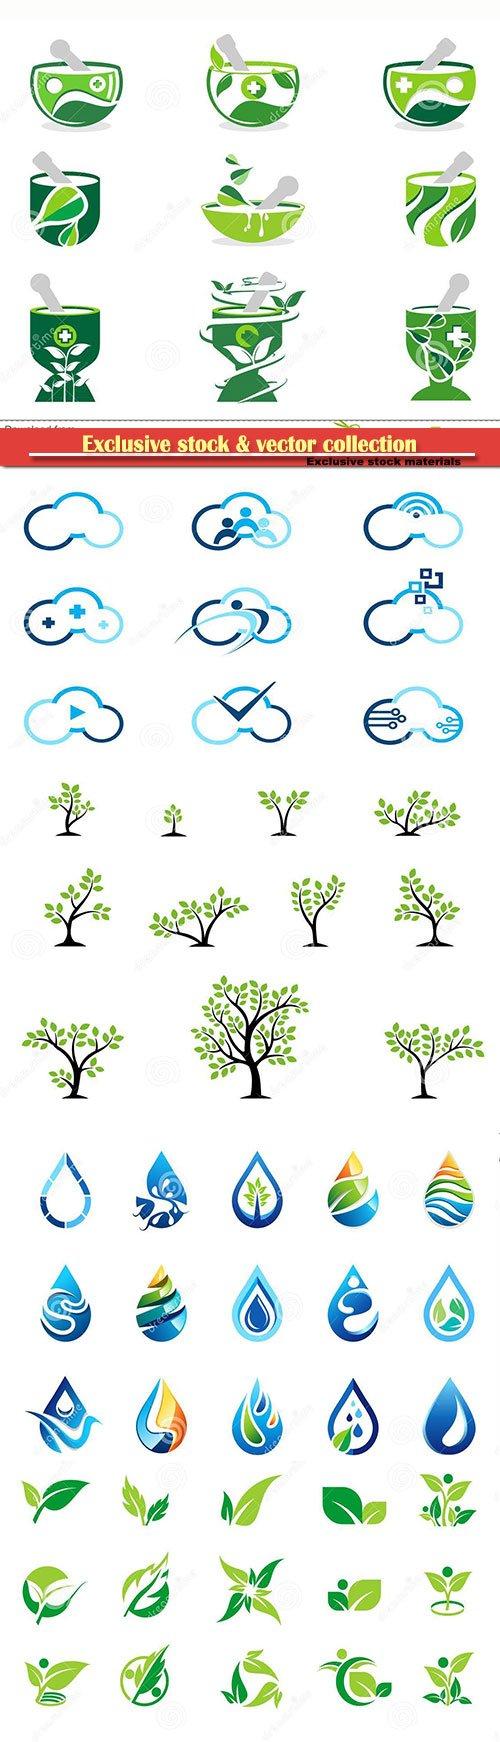 Logo and symbol icon set of vector designs